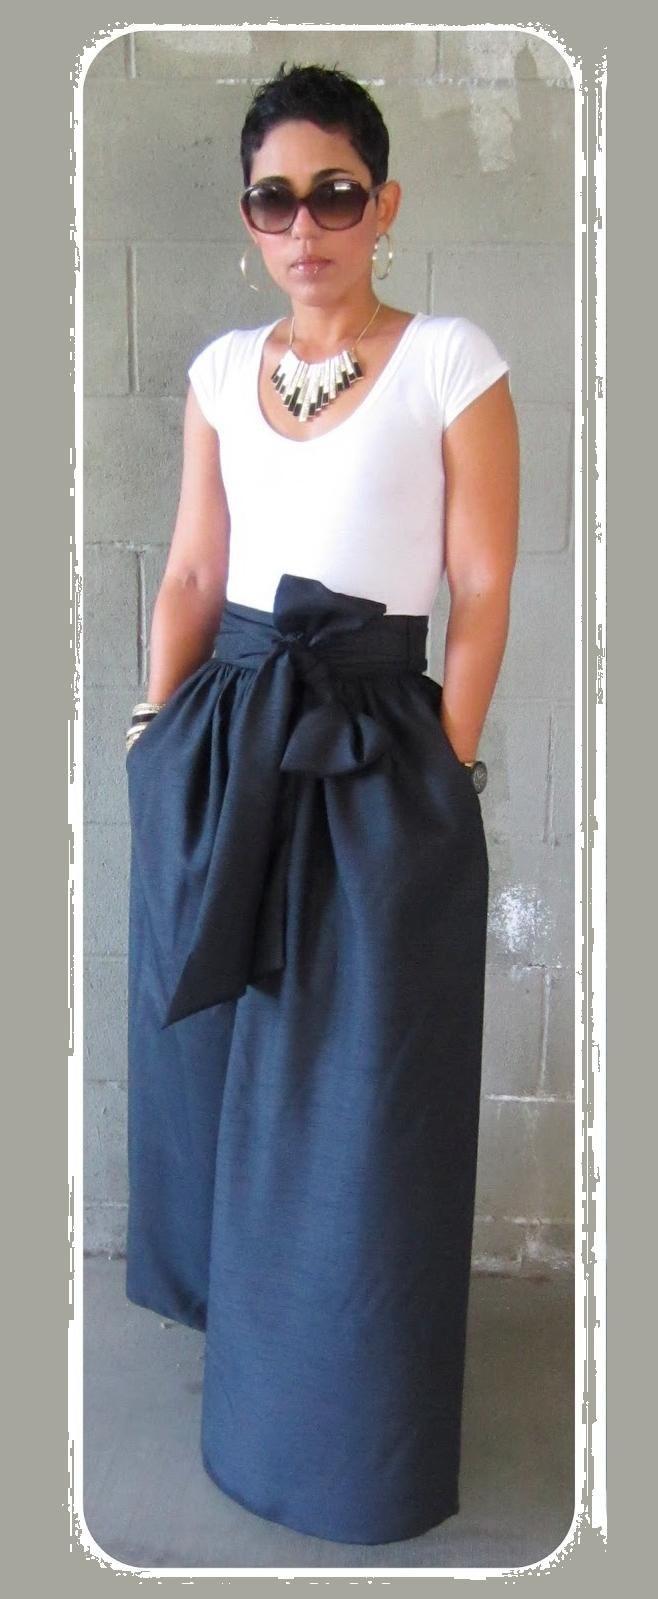 Серая юбка (134 фото): юбка-карандаш и юбка-солнце, с чем носить: блузка, кофта или костюм